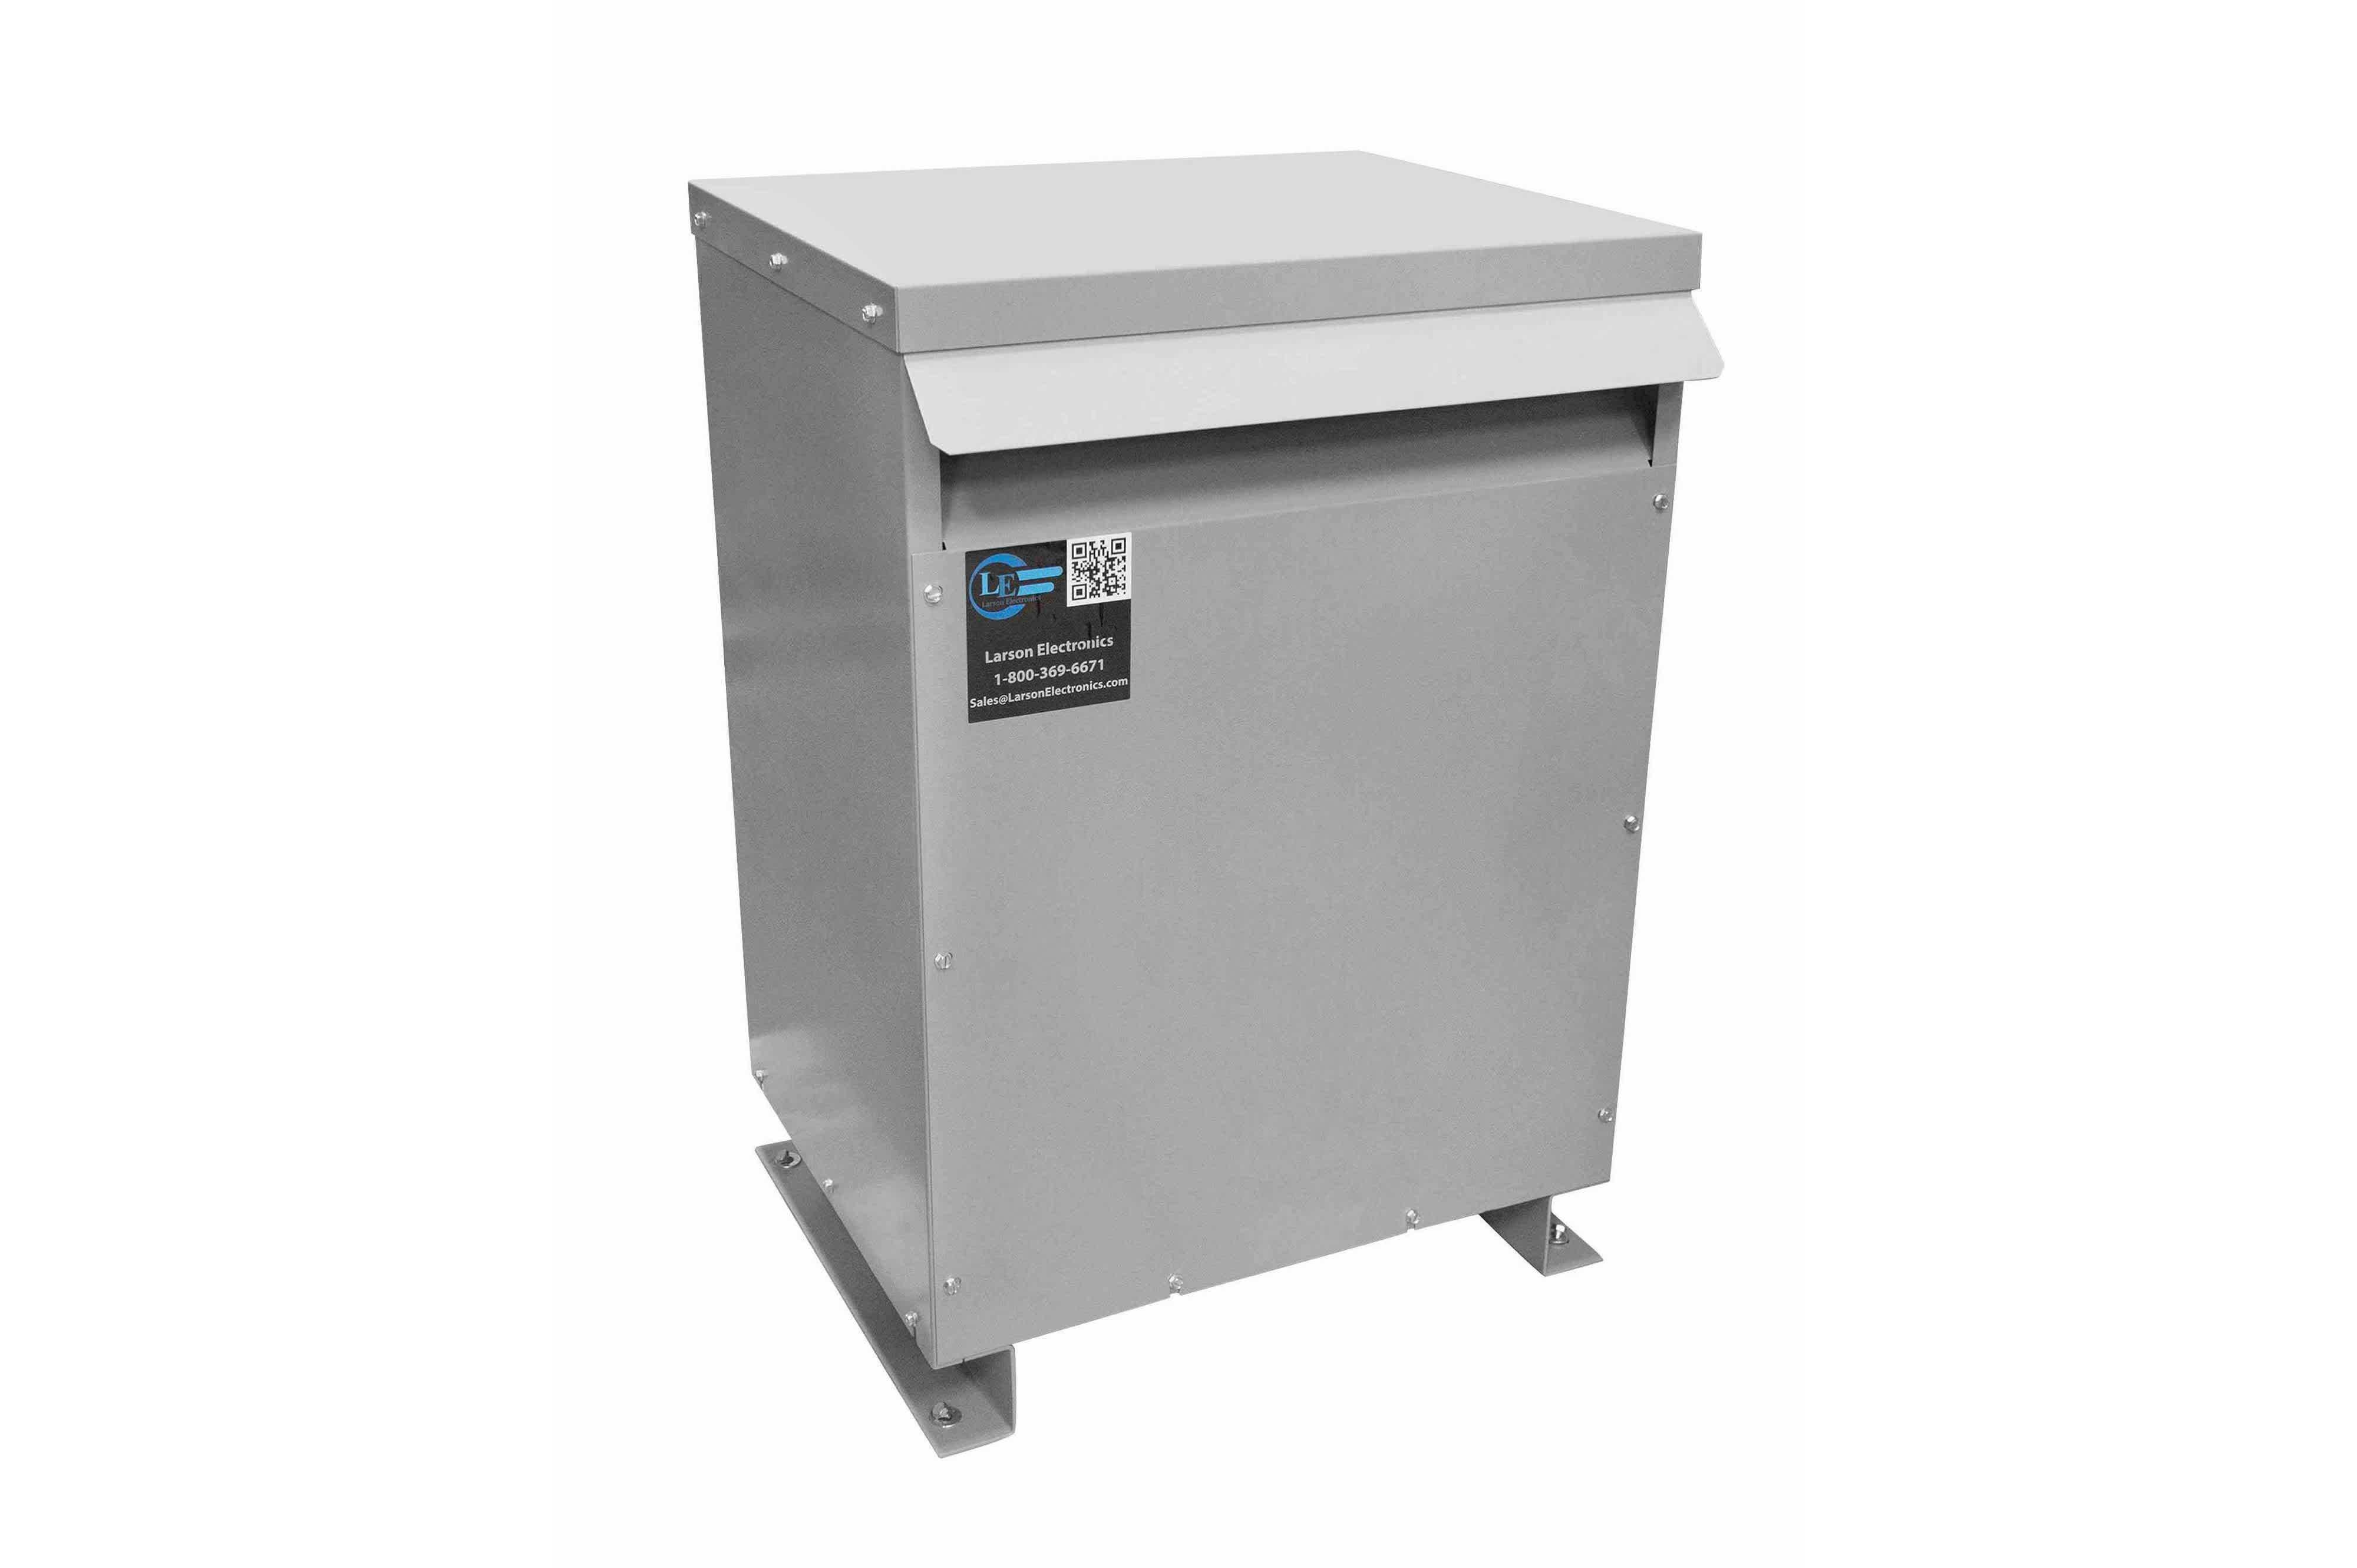 12 kVA 3PH Isolation Transformer, 460V Wye Primary, 600V Delta Secondary, N3R, Ventilated, 60 Hz